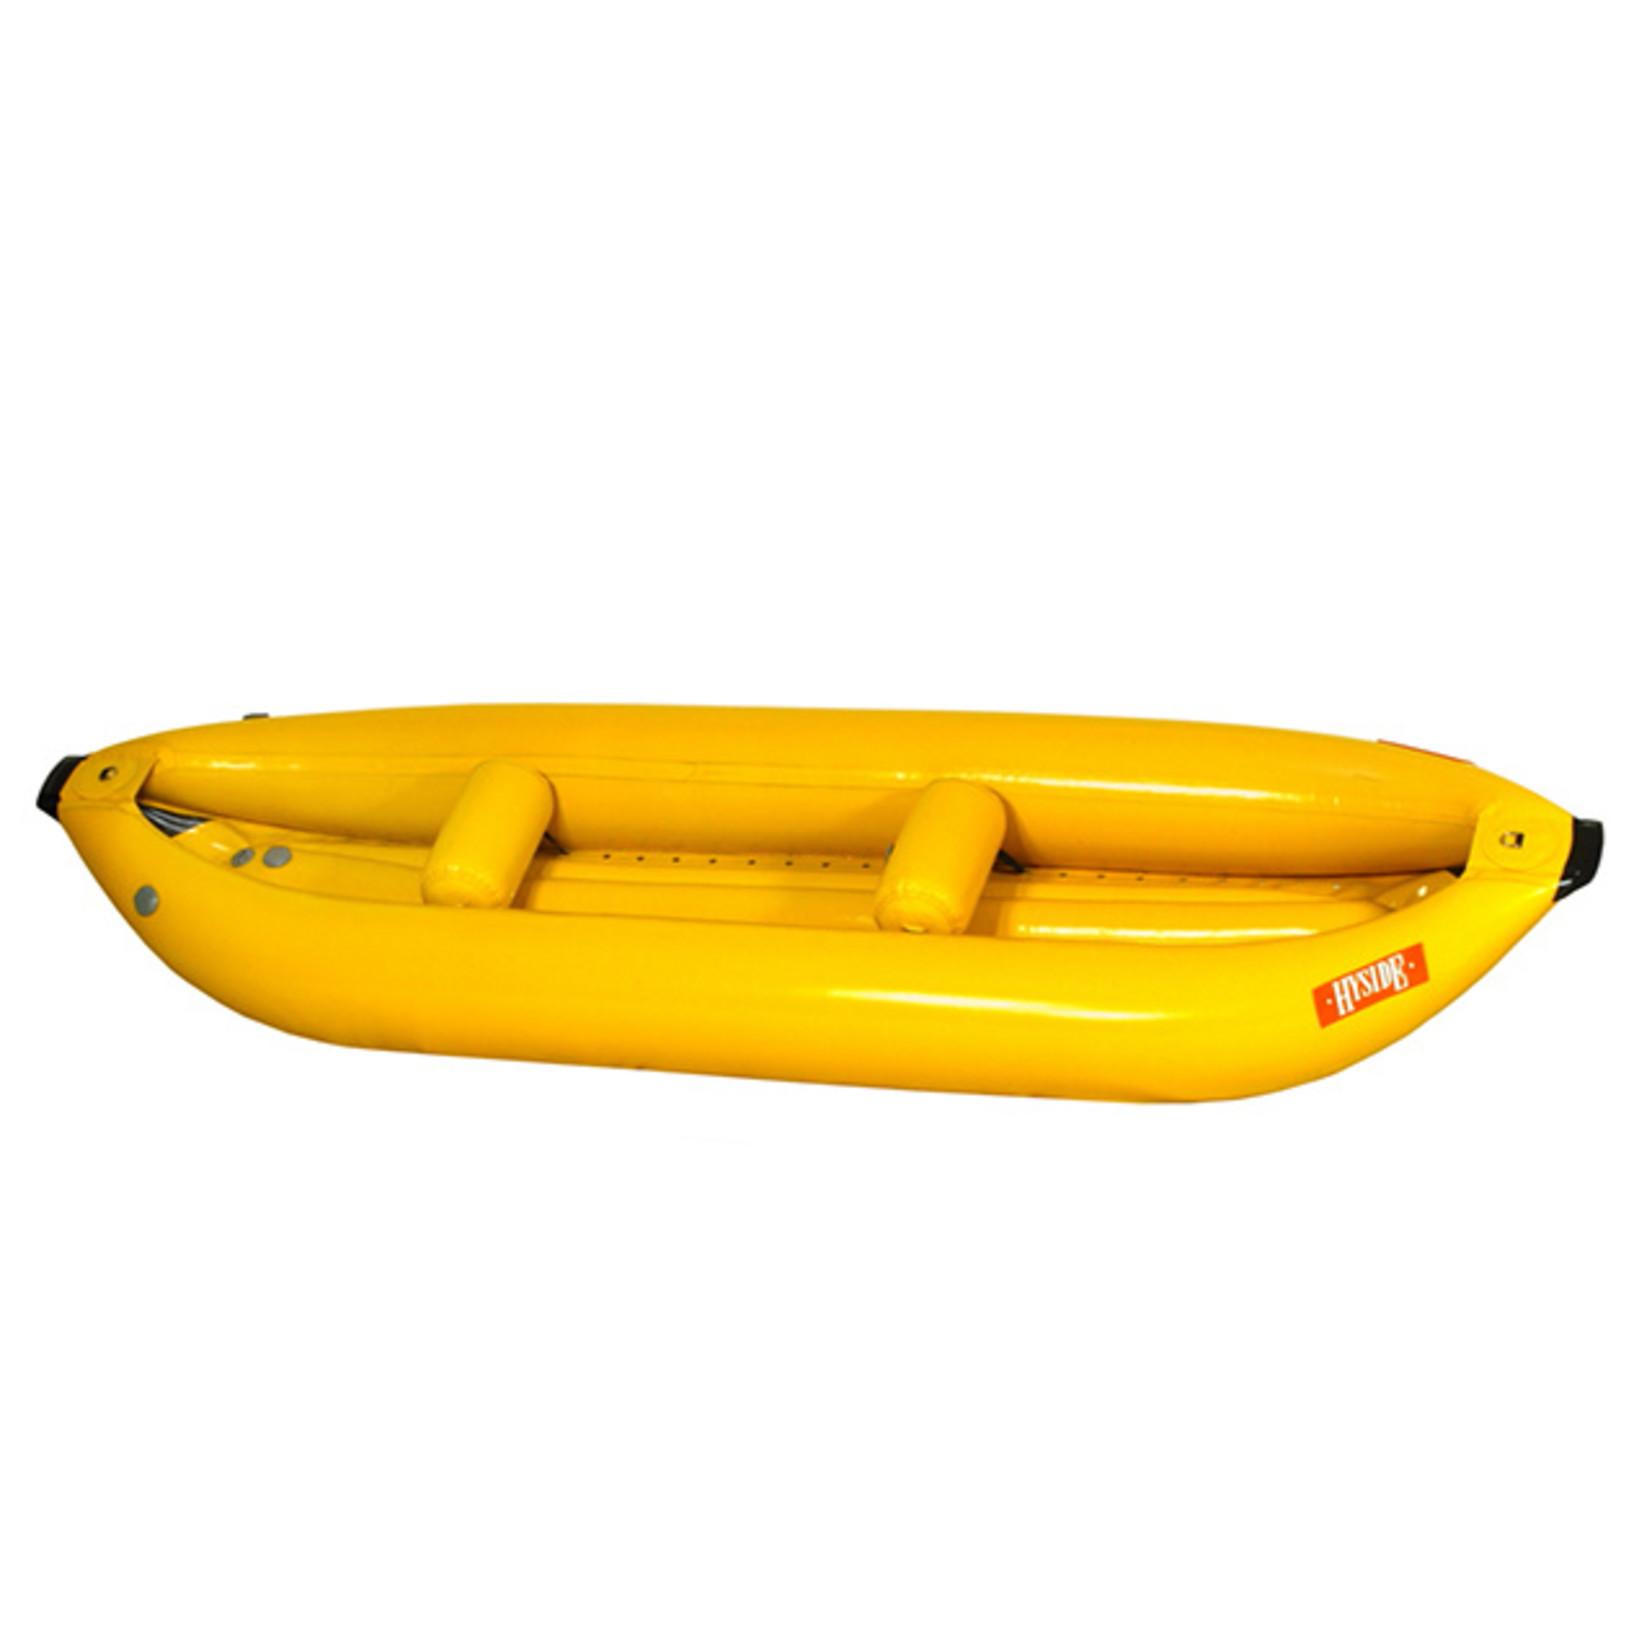 Hyside Inflatables Hyside Padillac II Kayak